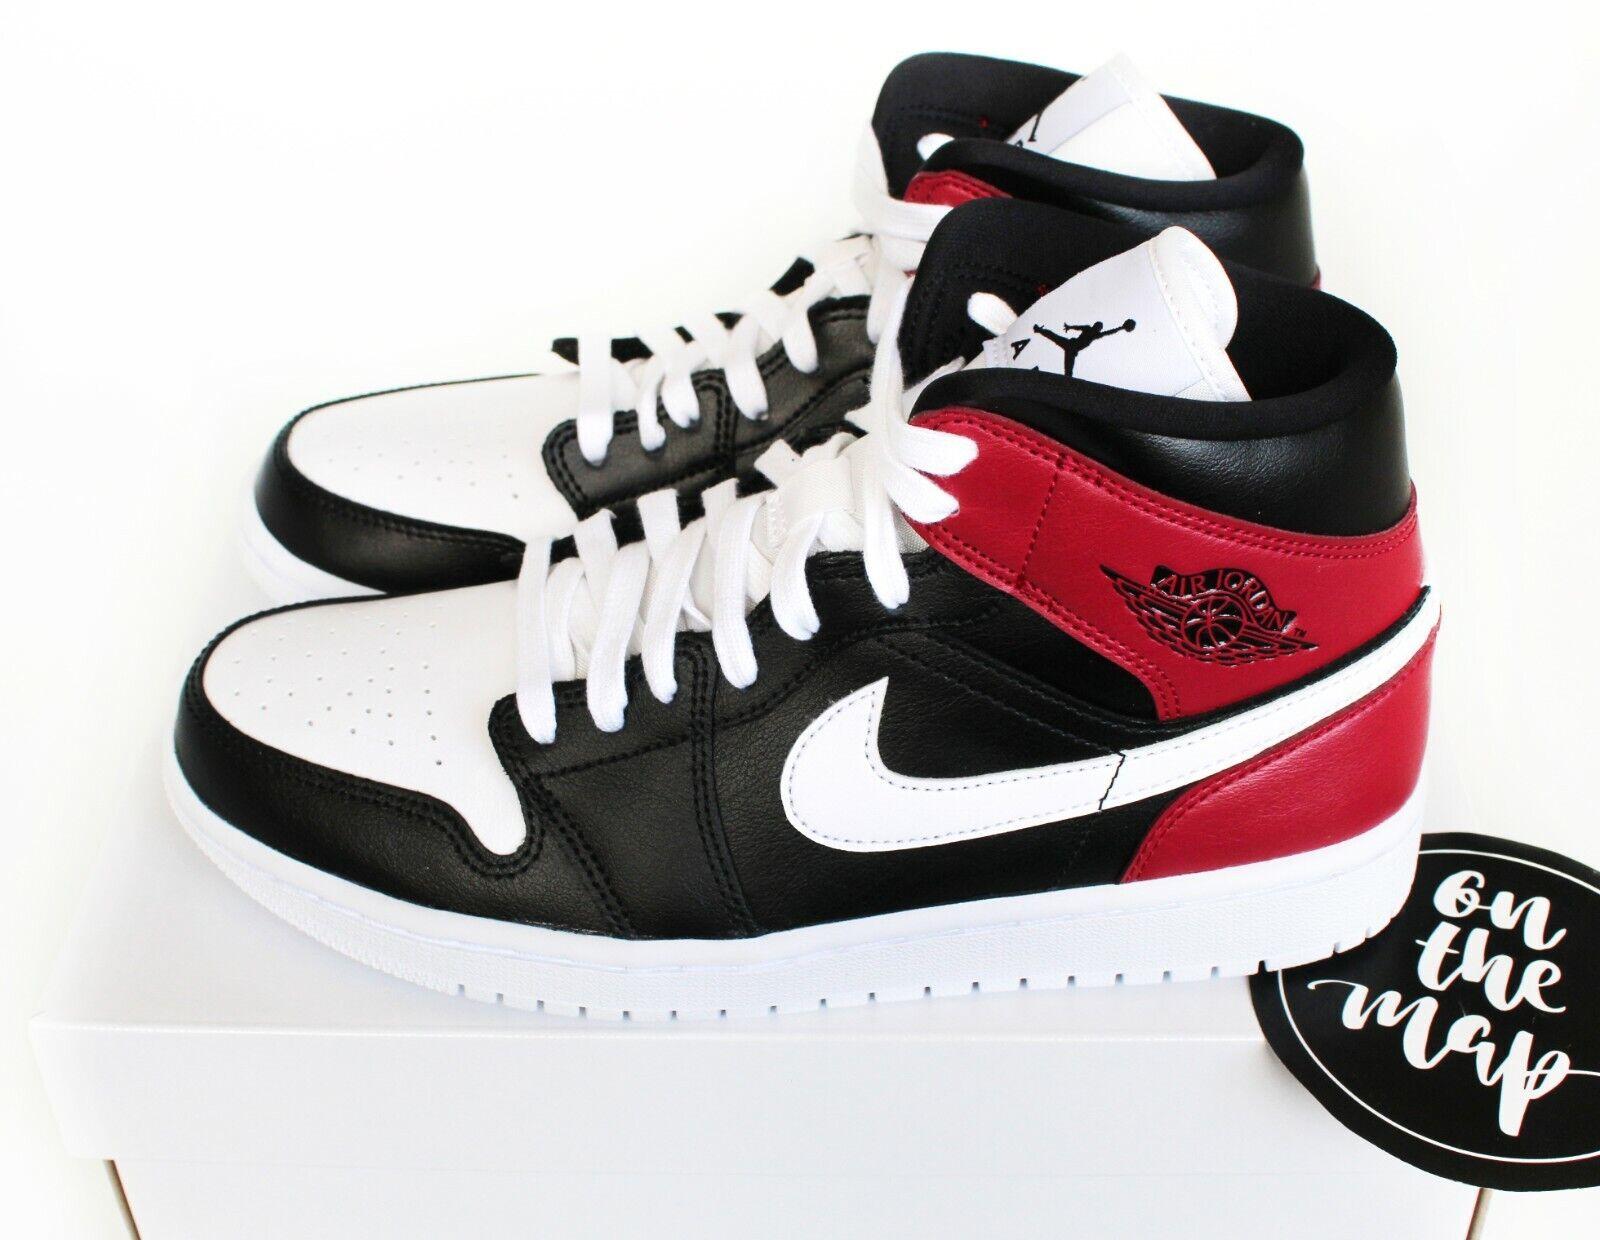 Nike Air Yeezy 2 NRG Solar Size 9